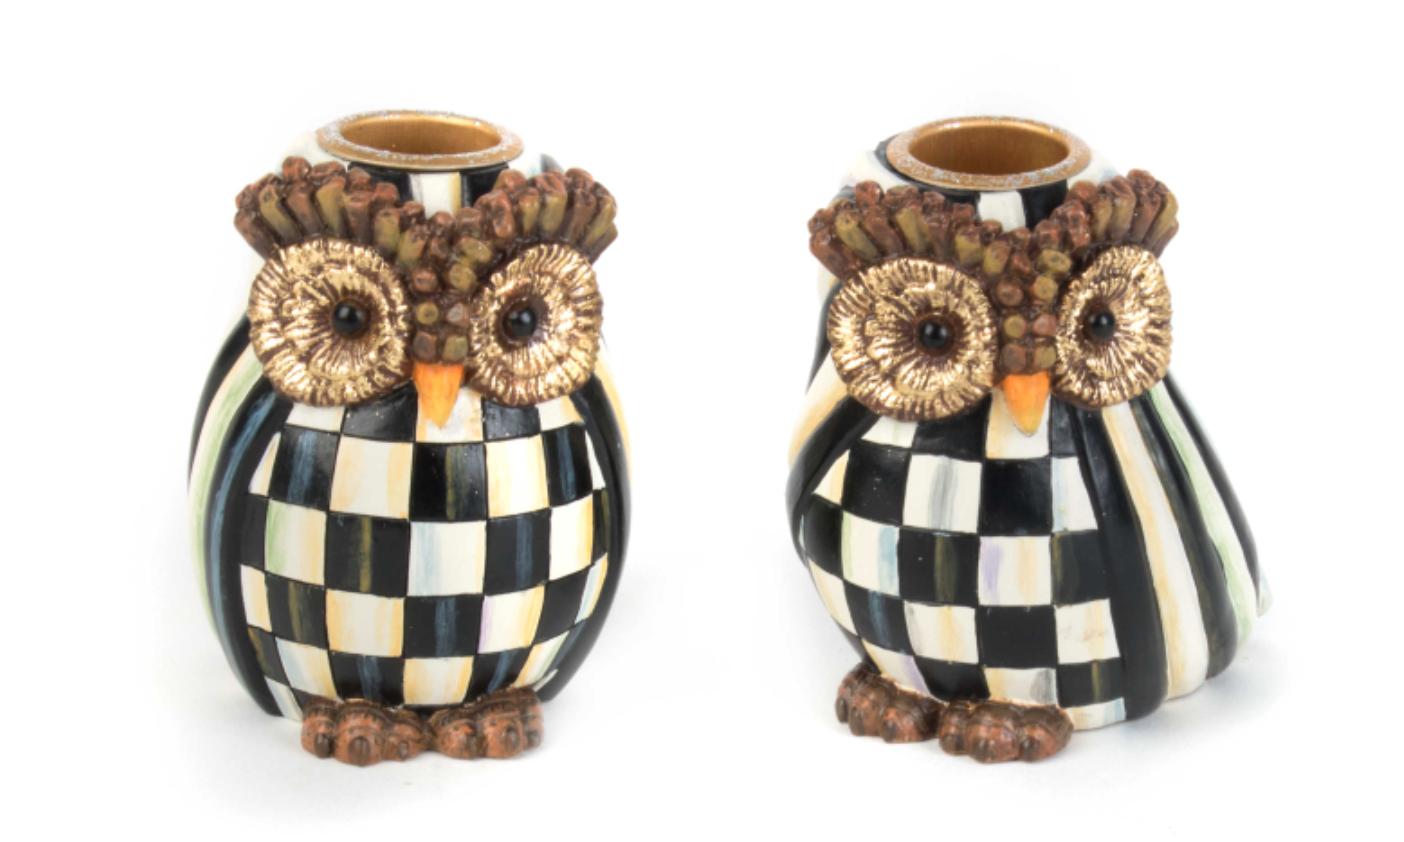 Owl candlesticks set